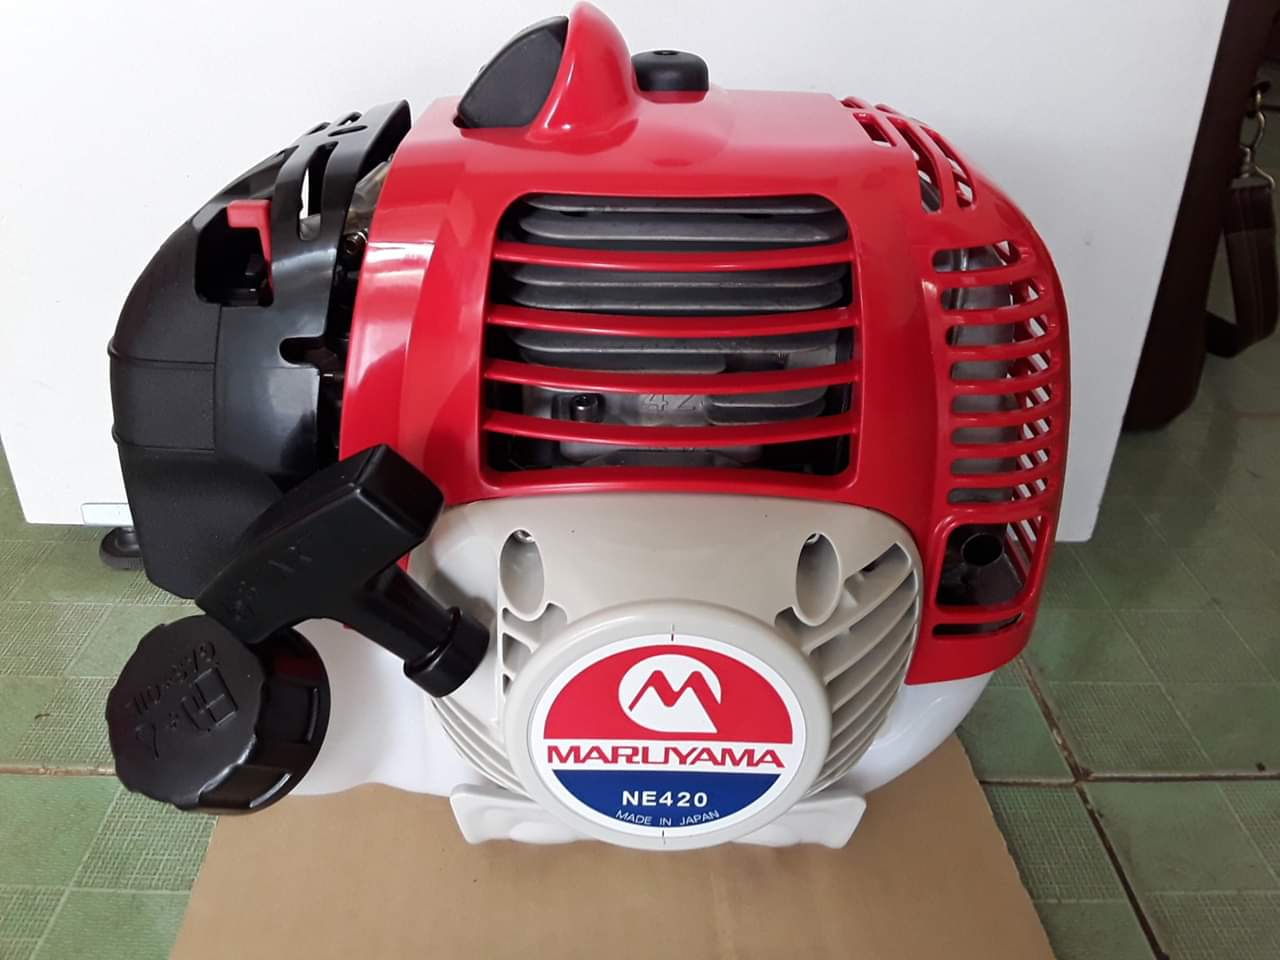 động cơ máy cắt cỏ Maruyama